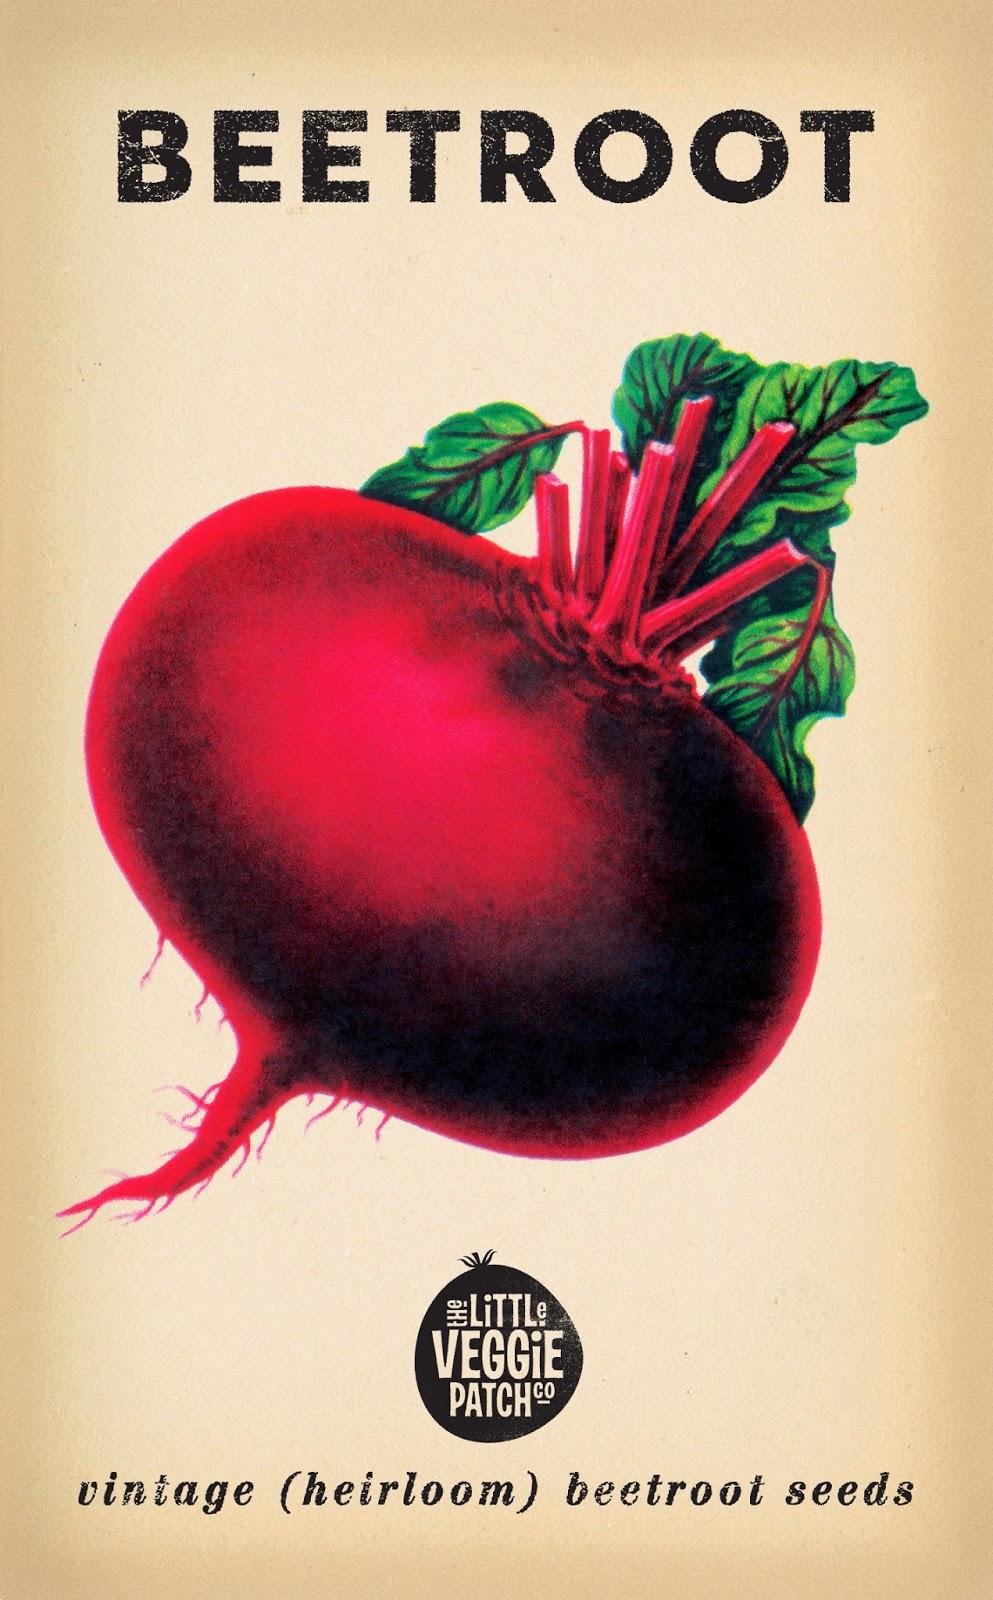 http://www.mrgift.com.au/the-little-veggie-patch-co/detroit-beetroot-seeds